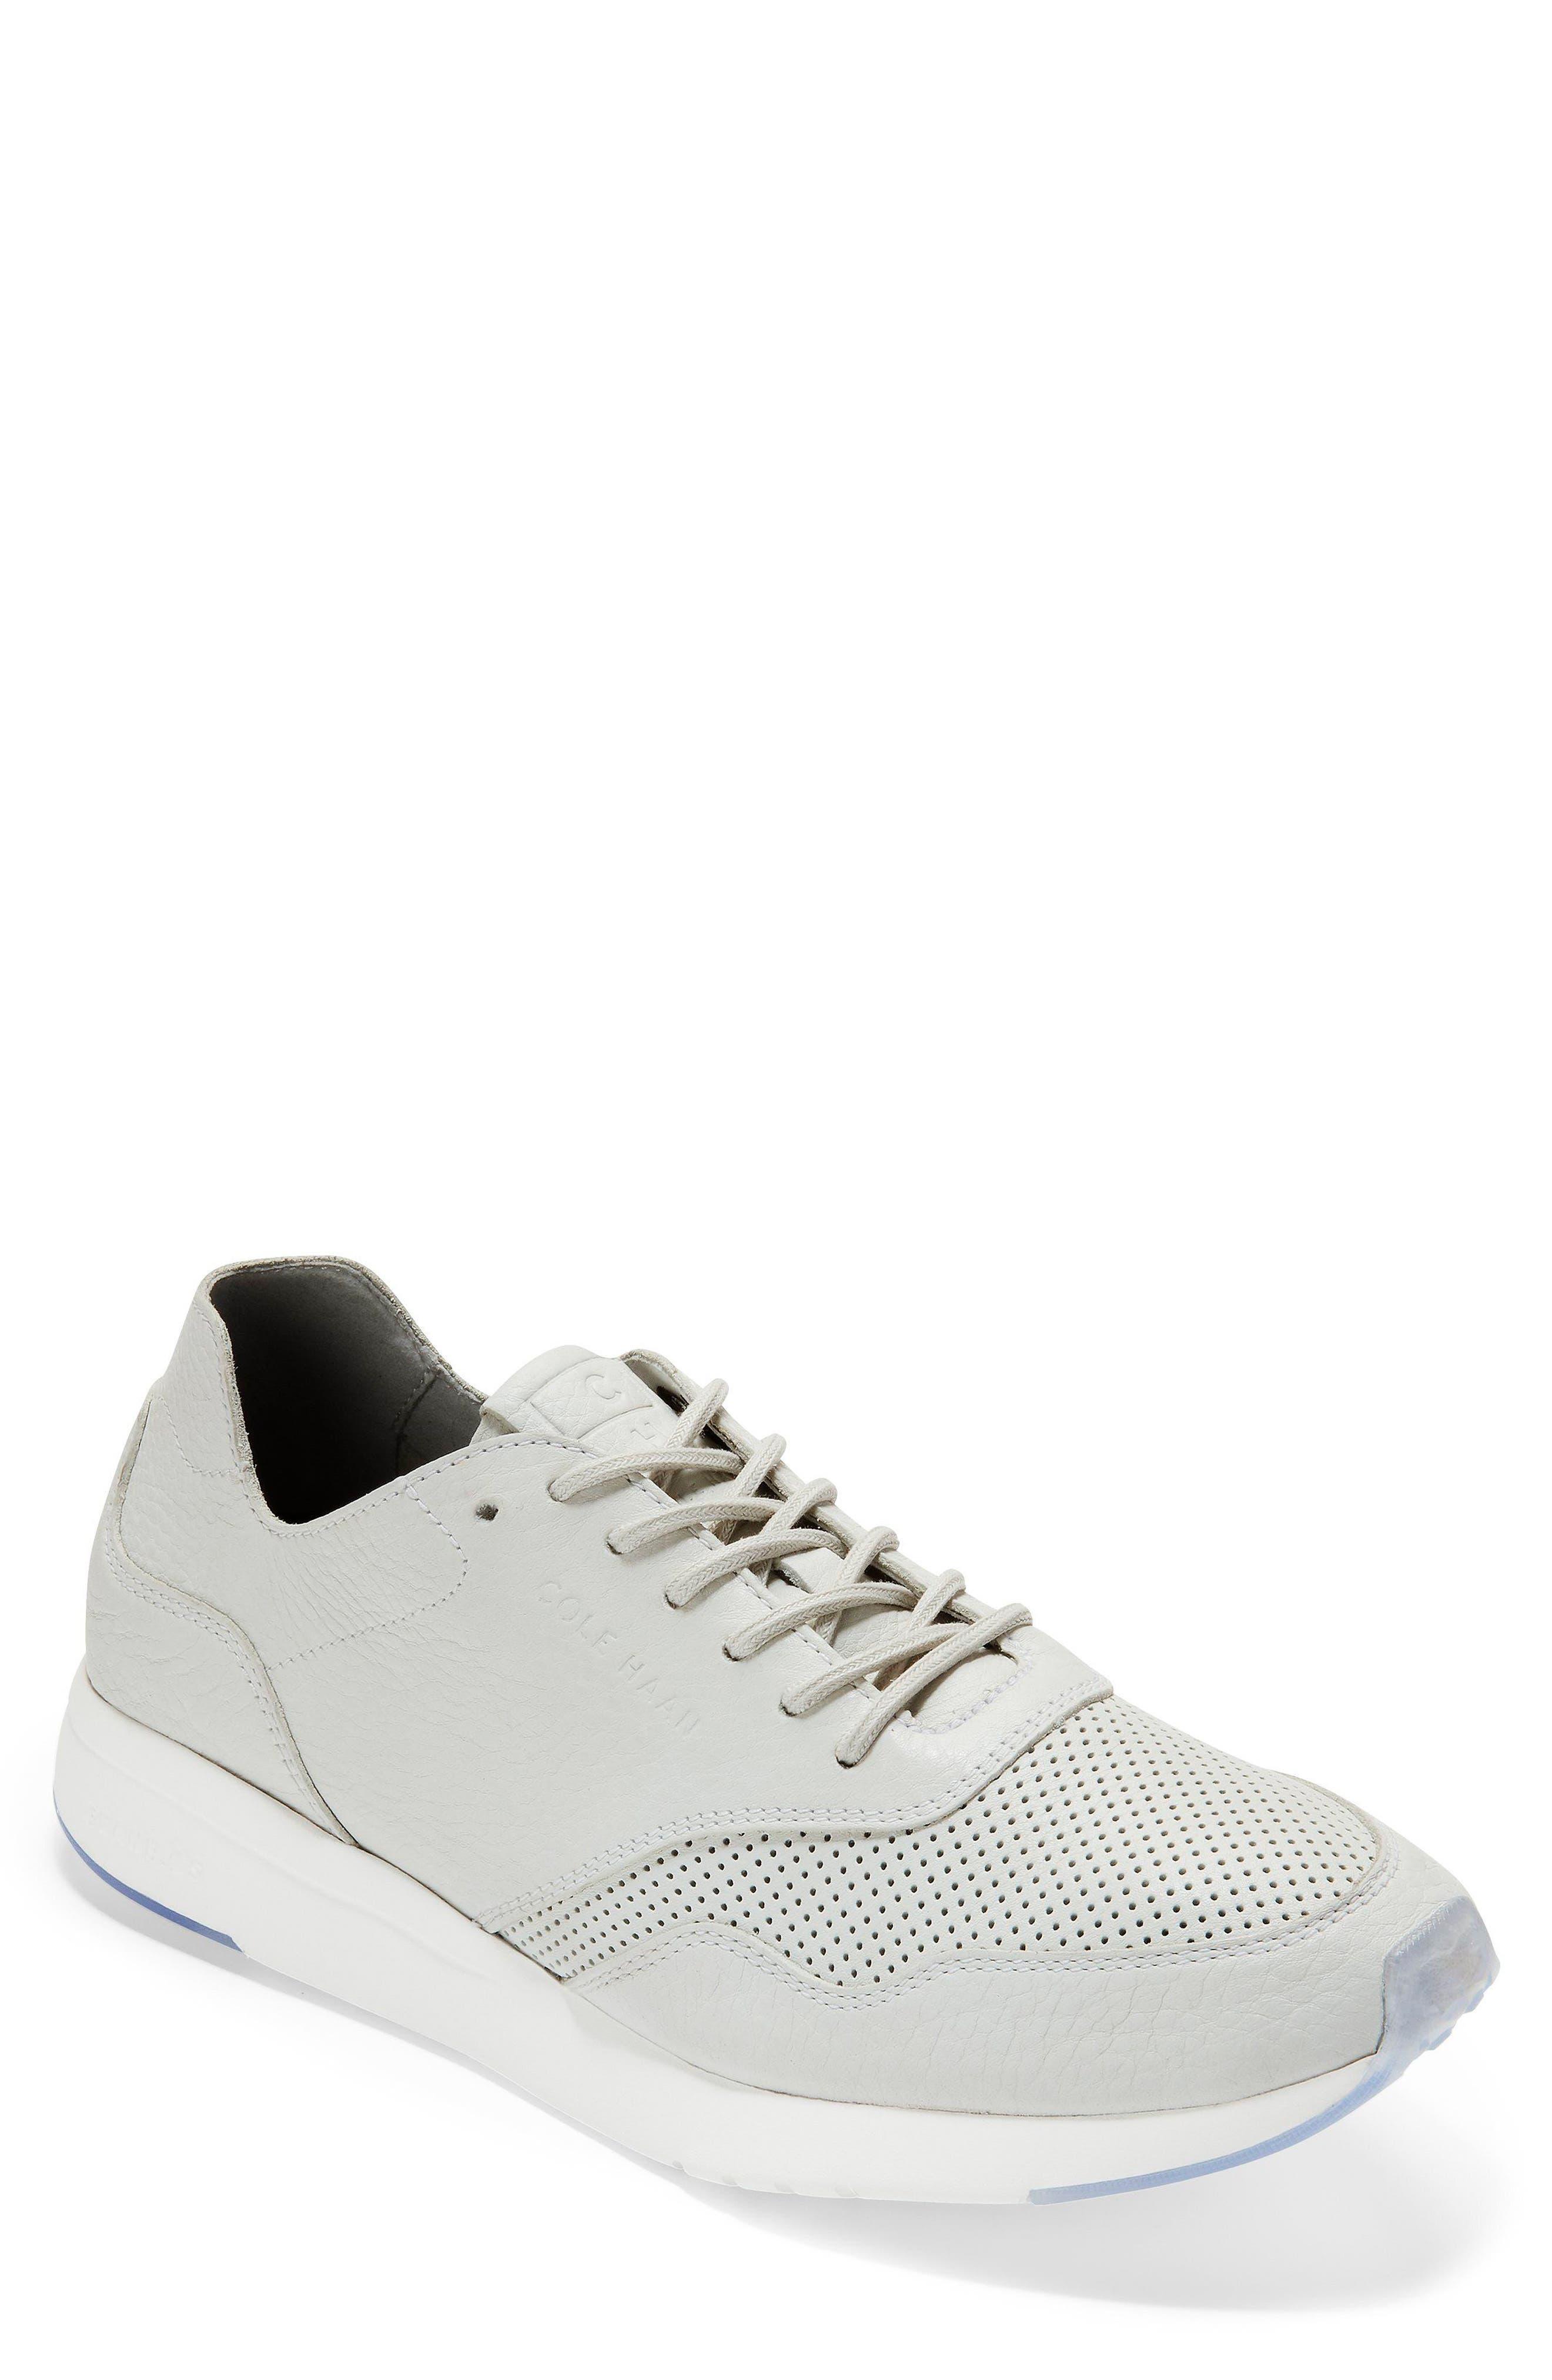 GrandPrø Deconstructed Running Sneaker,                             Main thumbnail 1, color,                             White Leather